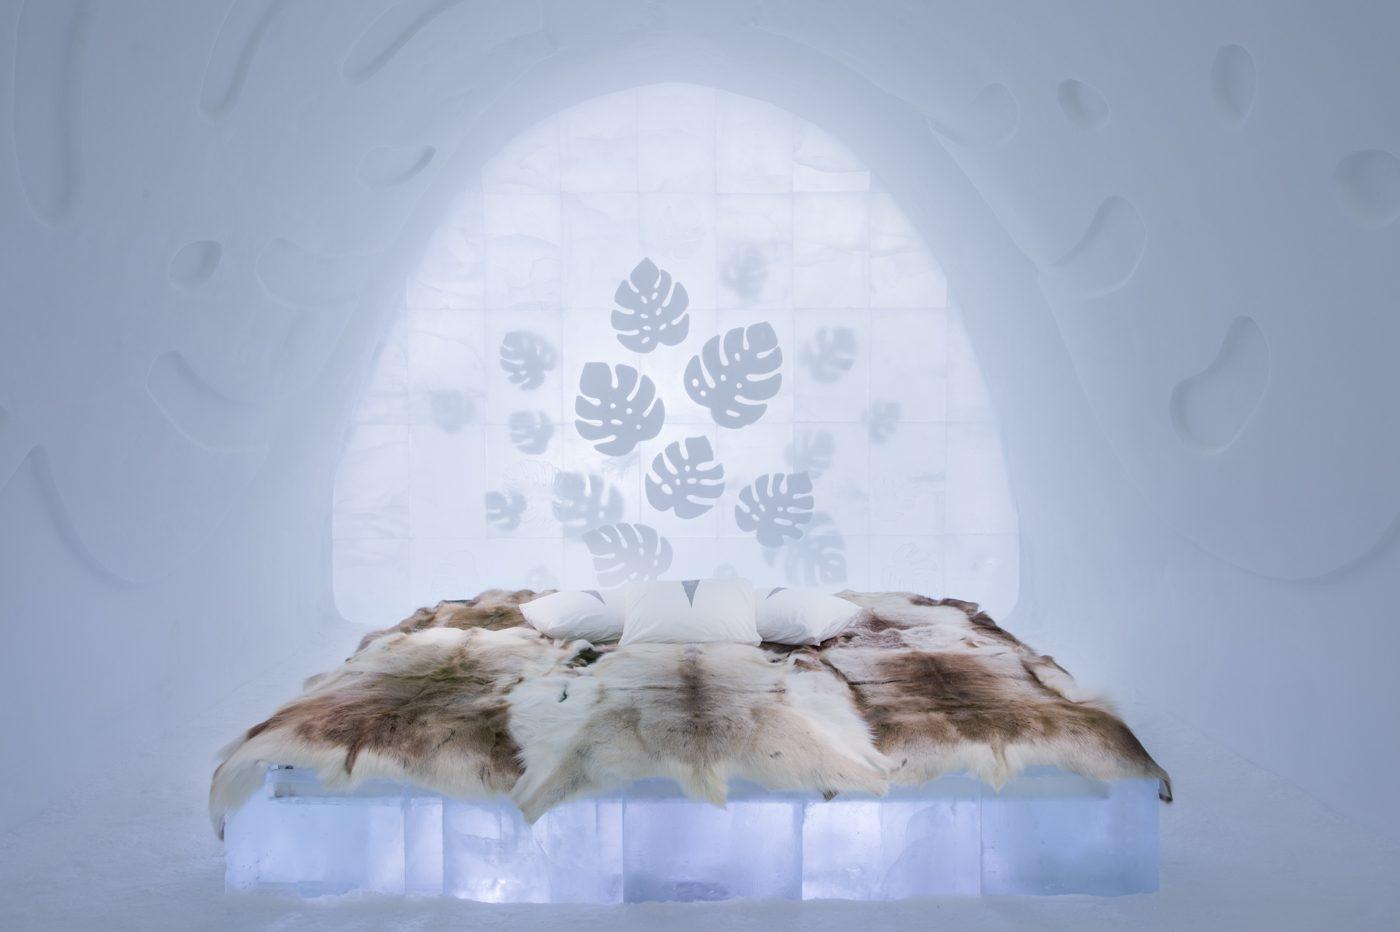 art-suite-monstera-icehotel-28-1400x932